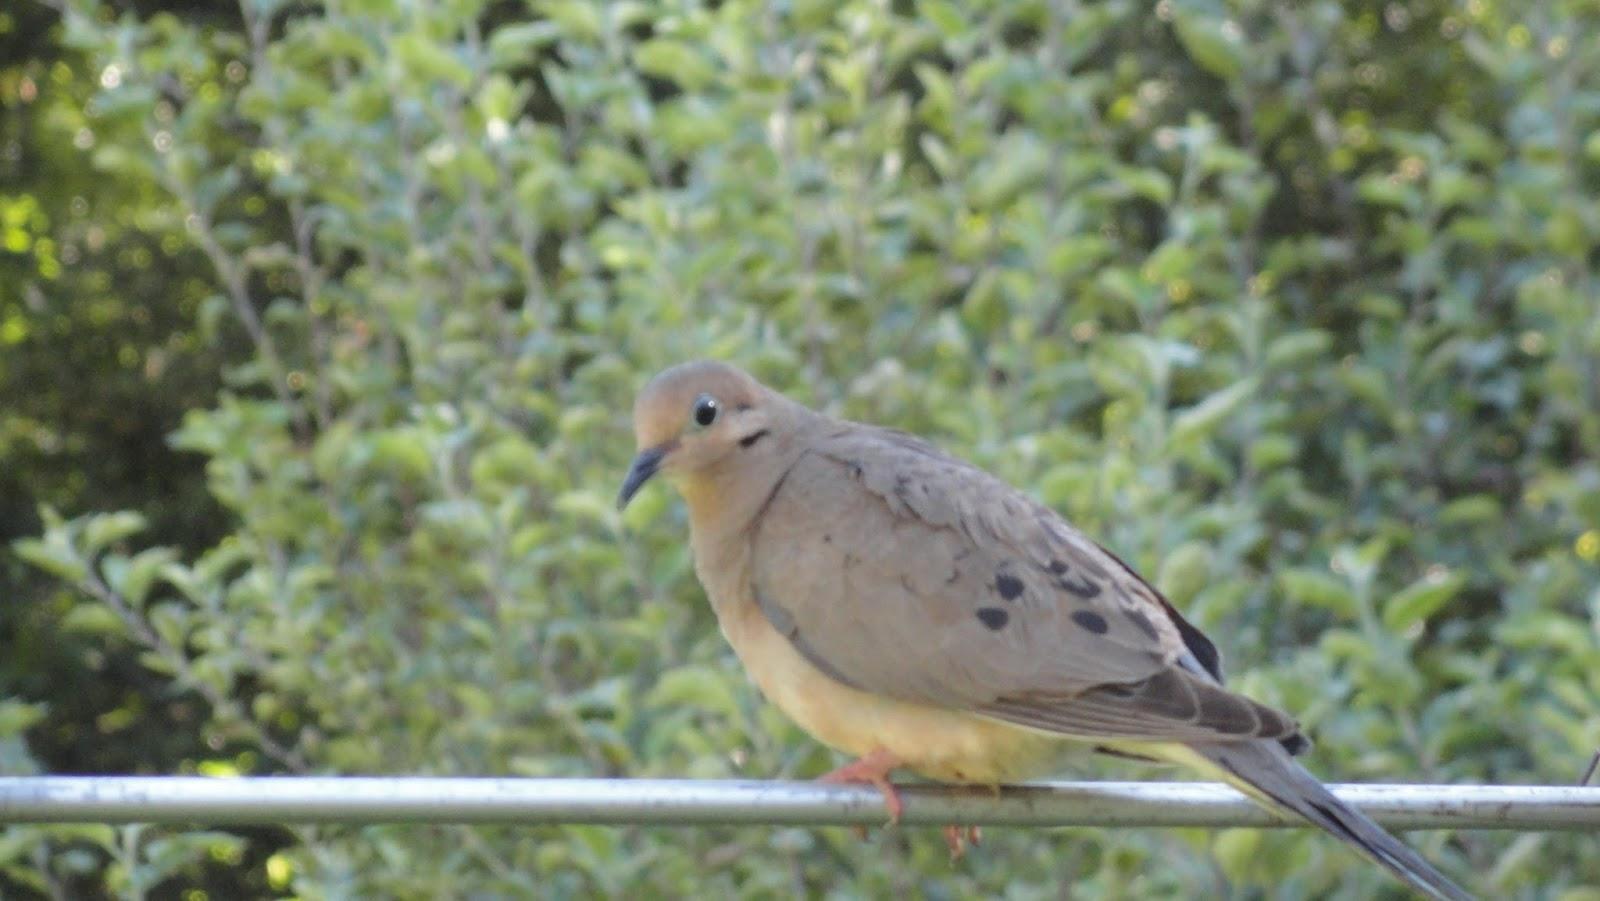 Birds in Your Backyard: Ontario - 2013 - Week Four